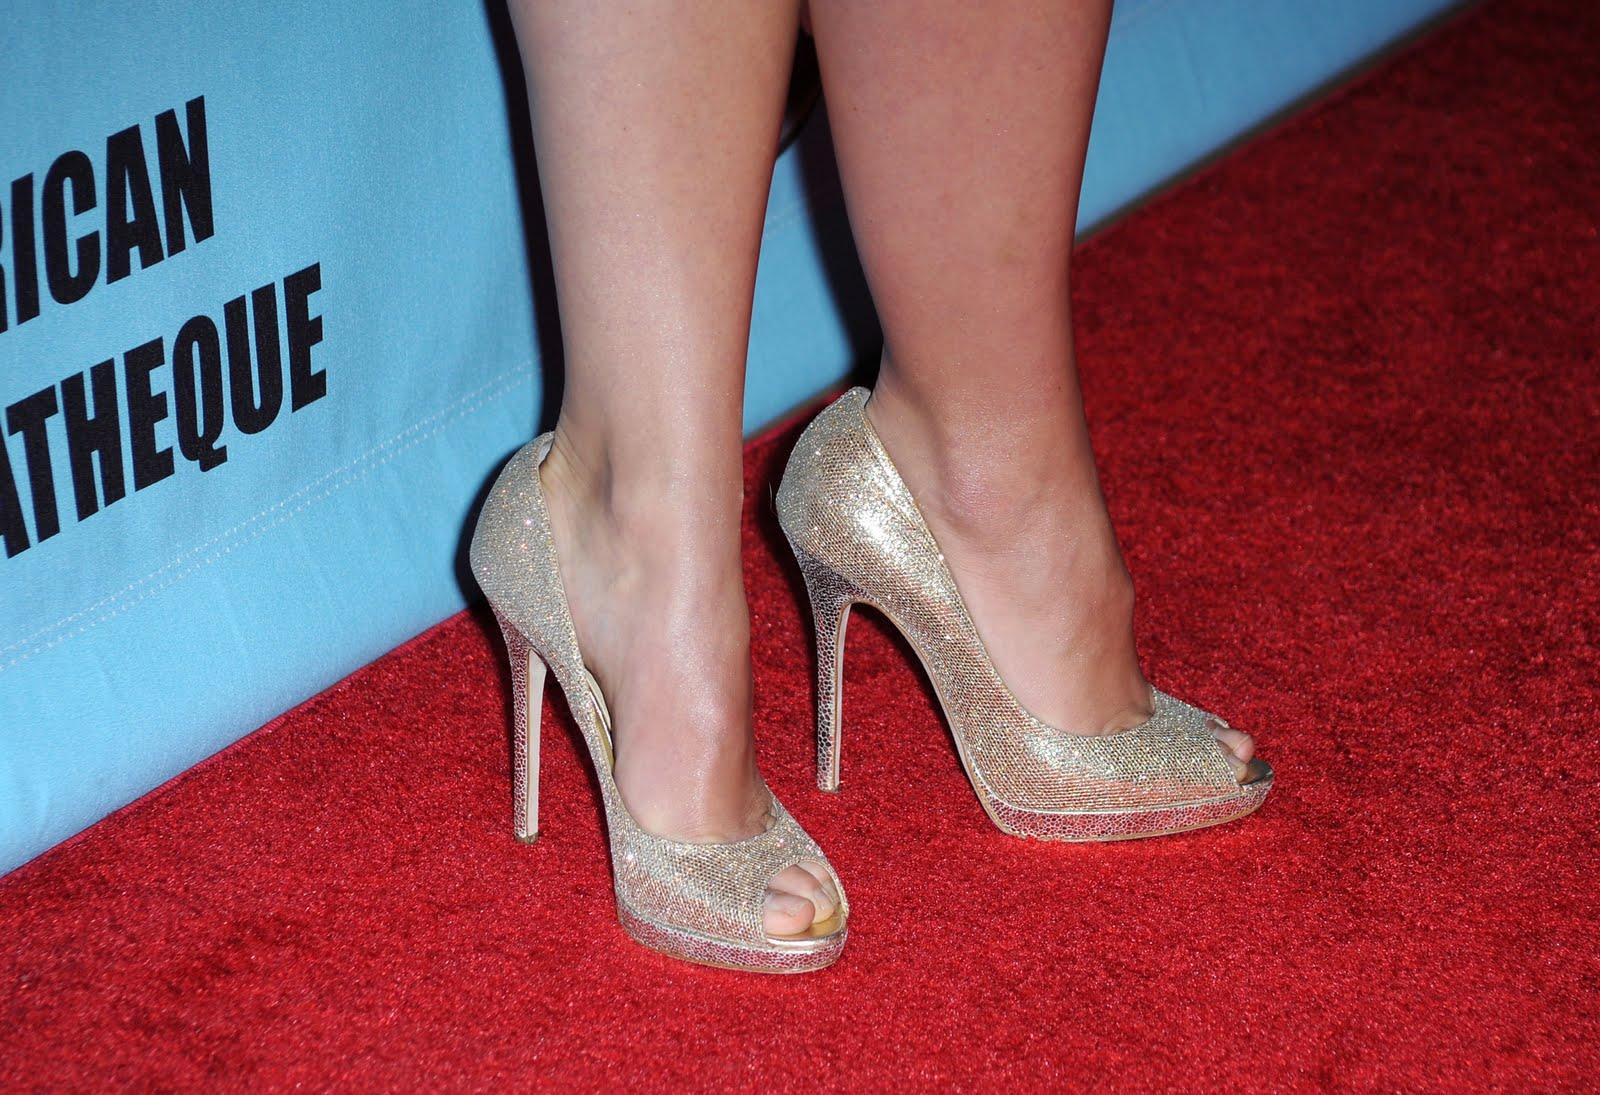 http://2.bp.blogspot.com/_UaLWp72nij4/TCJzrj9npLI/AAAAAAAAPws/Rf2GVe1VL1g/s1600/olivia-wilde-feet-4.jpg